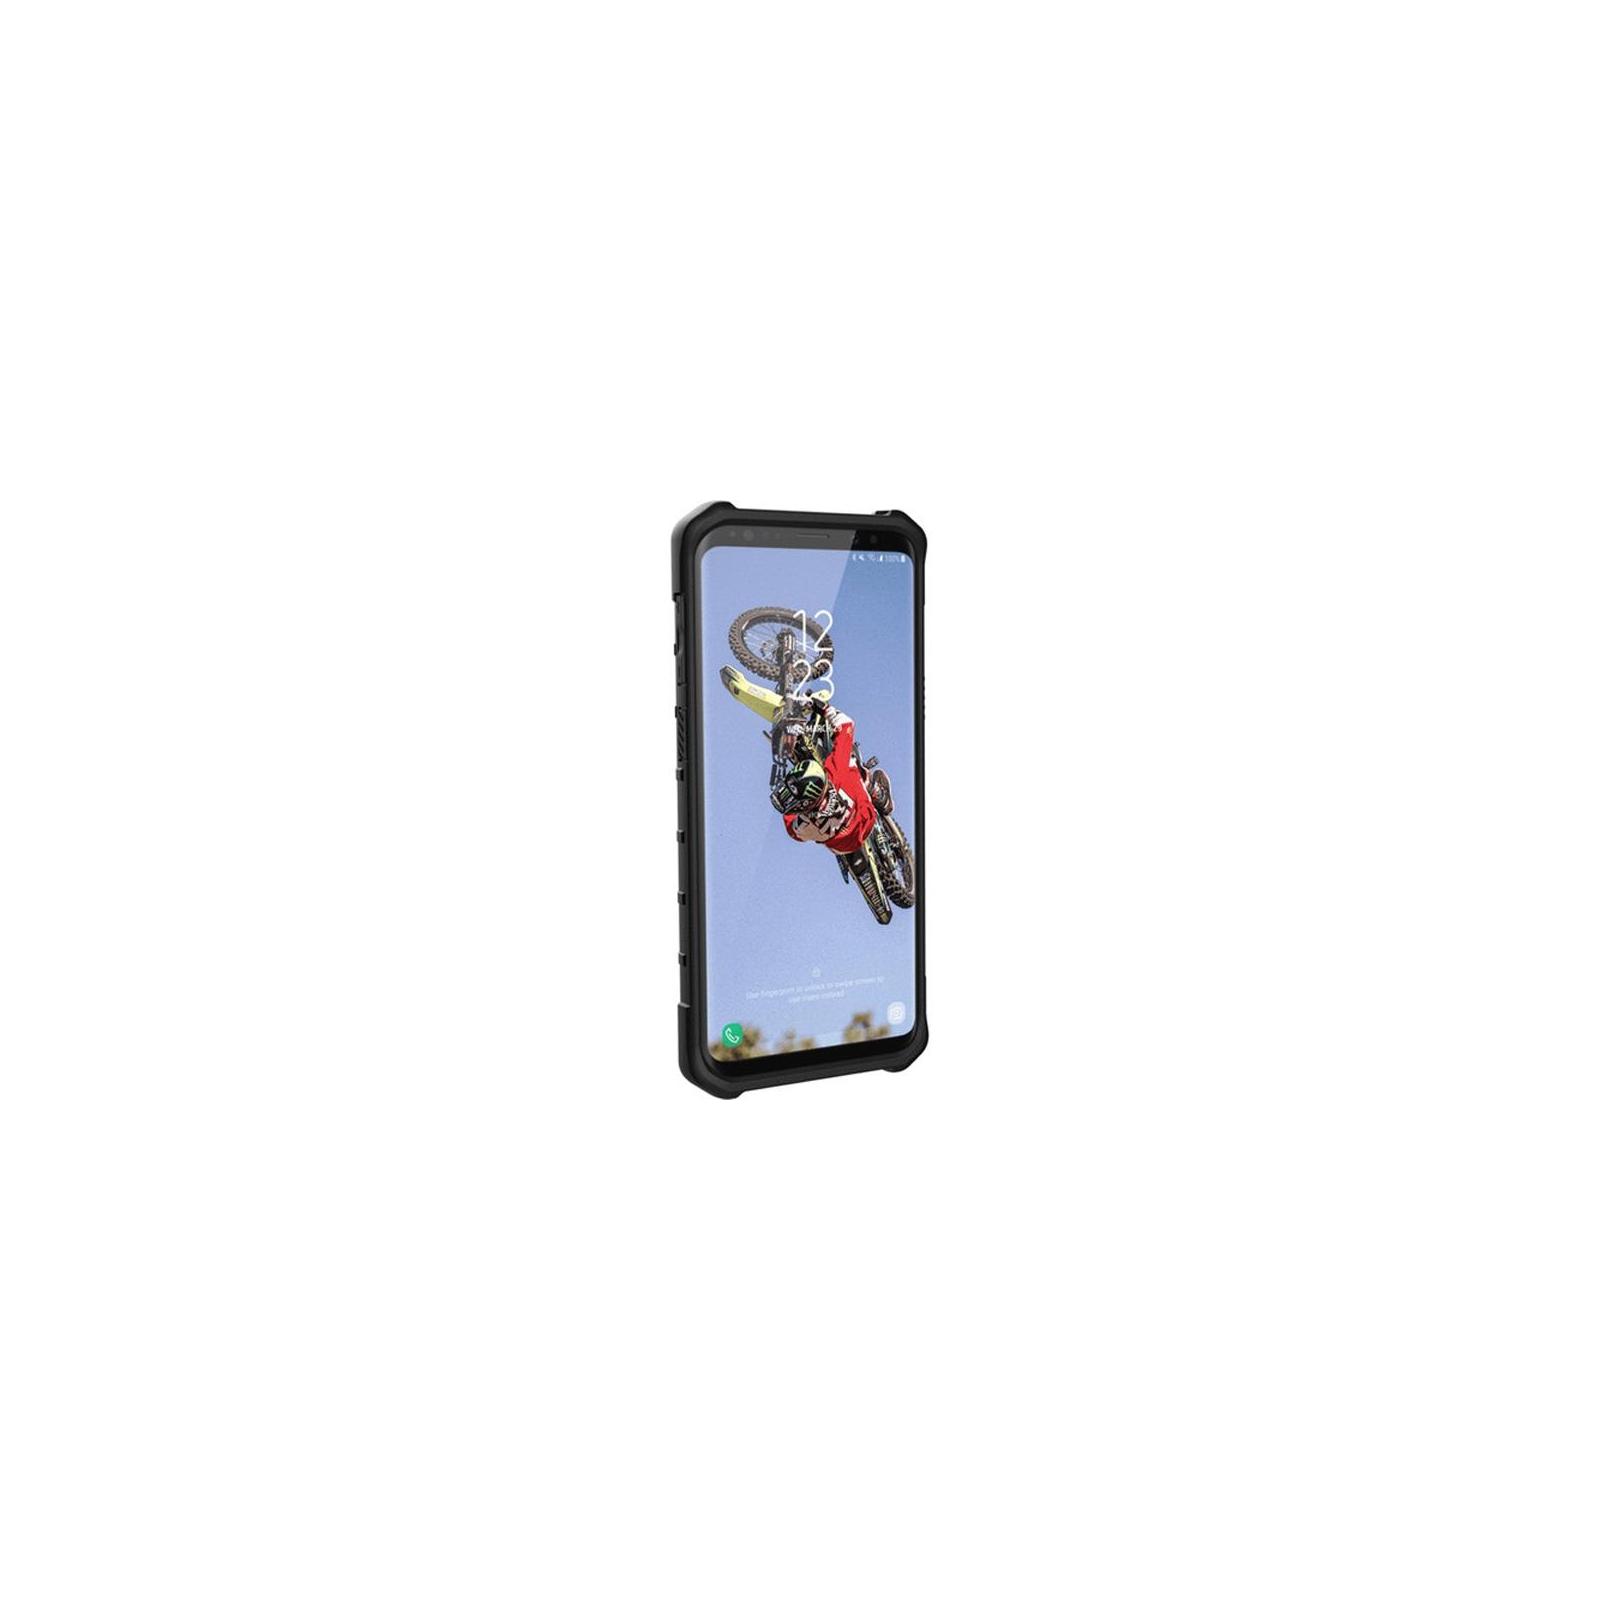 Чехол для моб. телефона Uag Galaxy S9 Pathfinder Black (GLXS9-A-BK) изображение 3